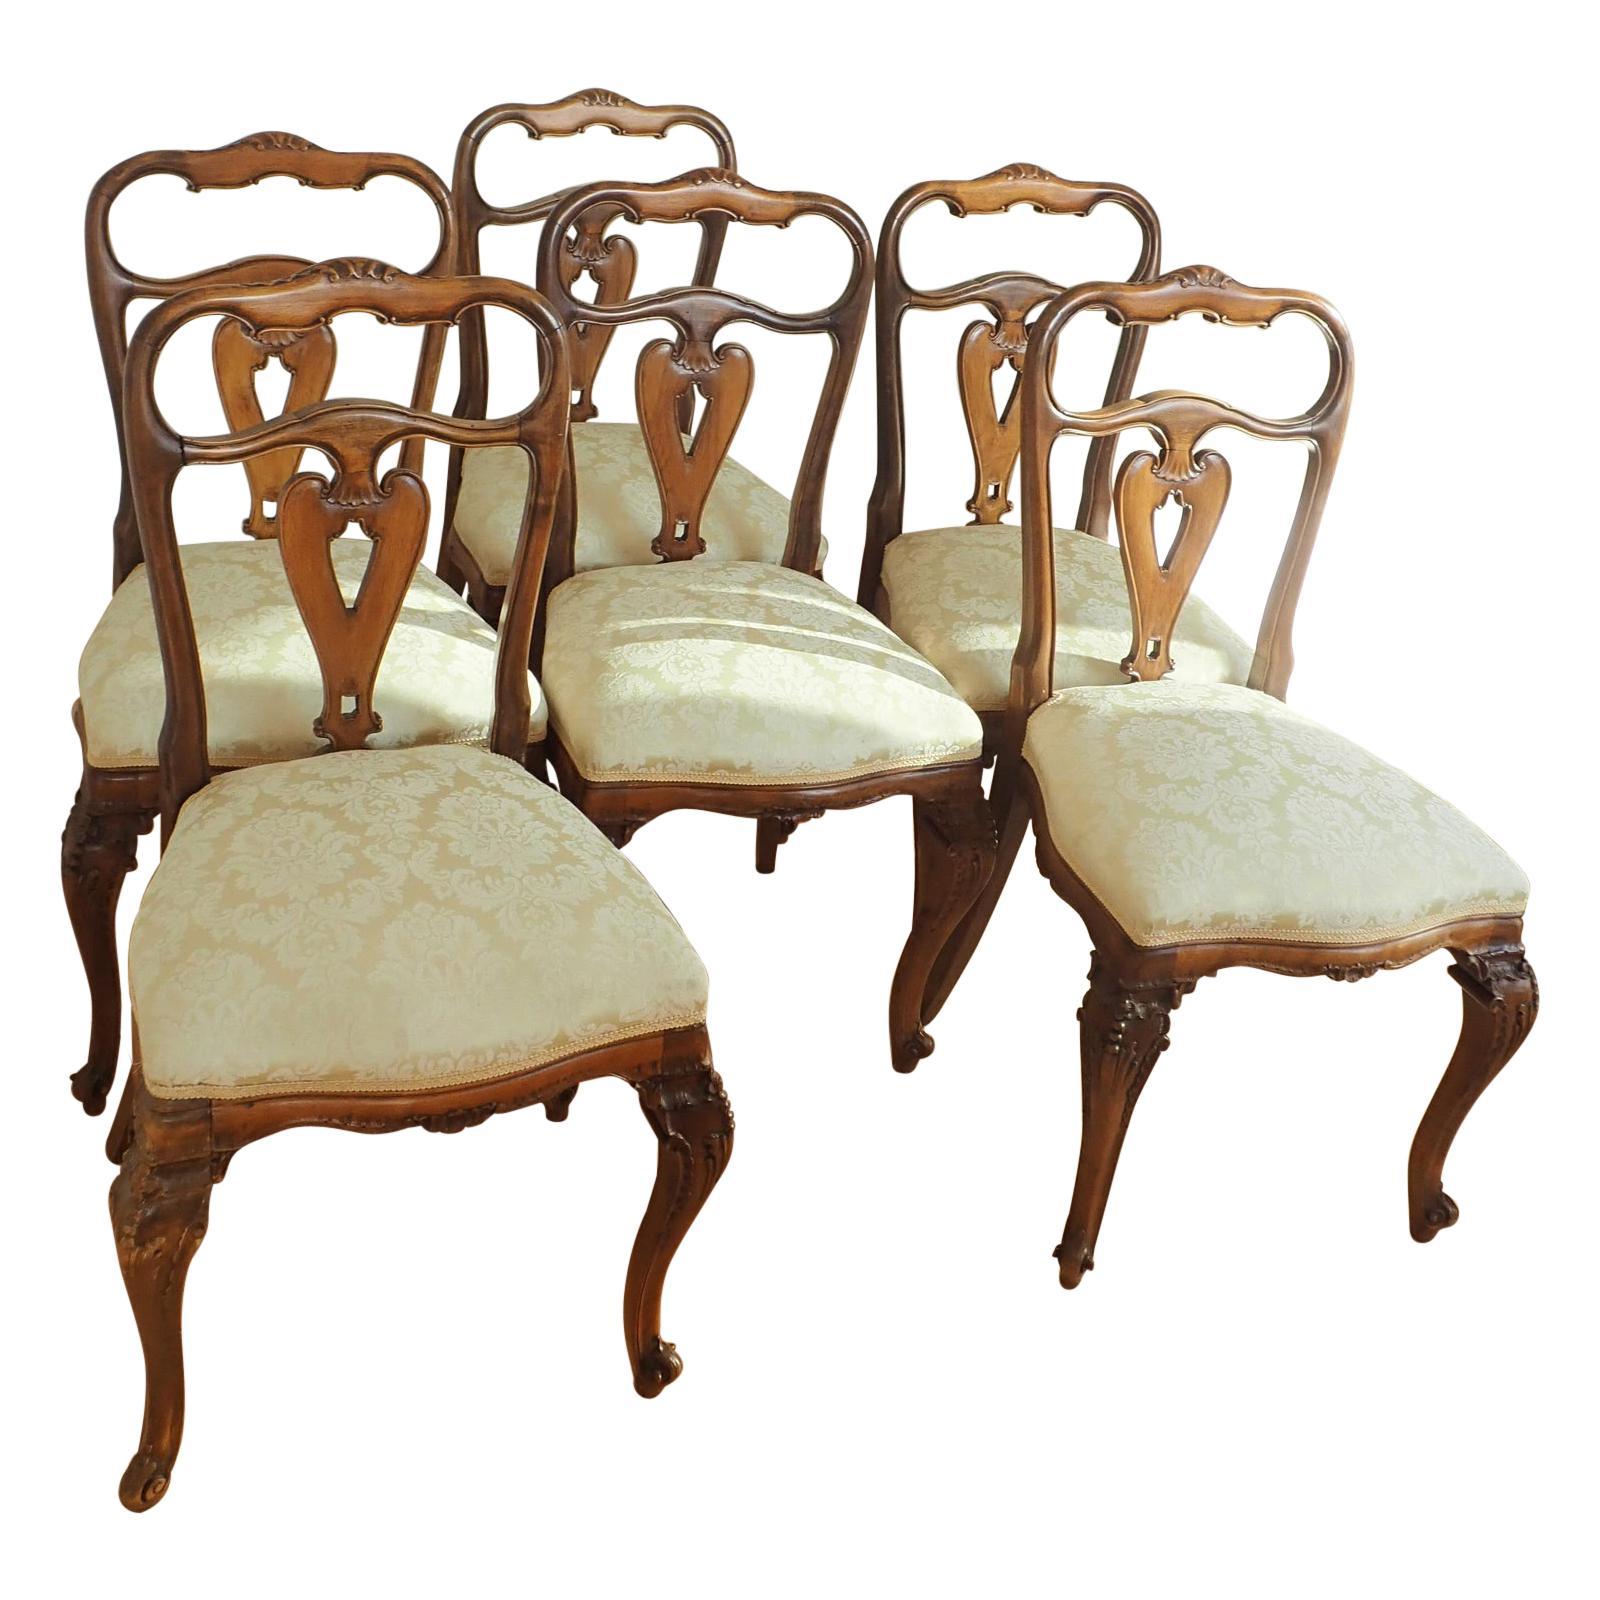 6 Italian Walnut Rococo Dining Room Chairs